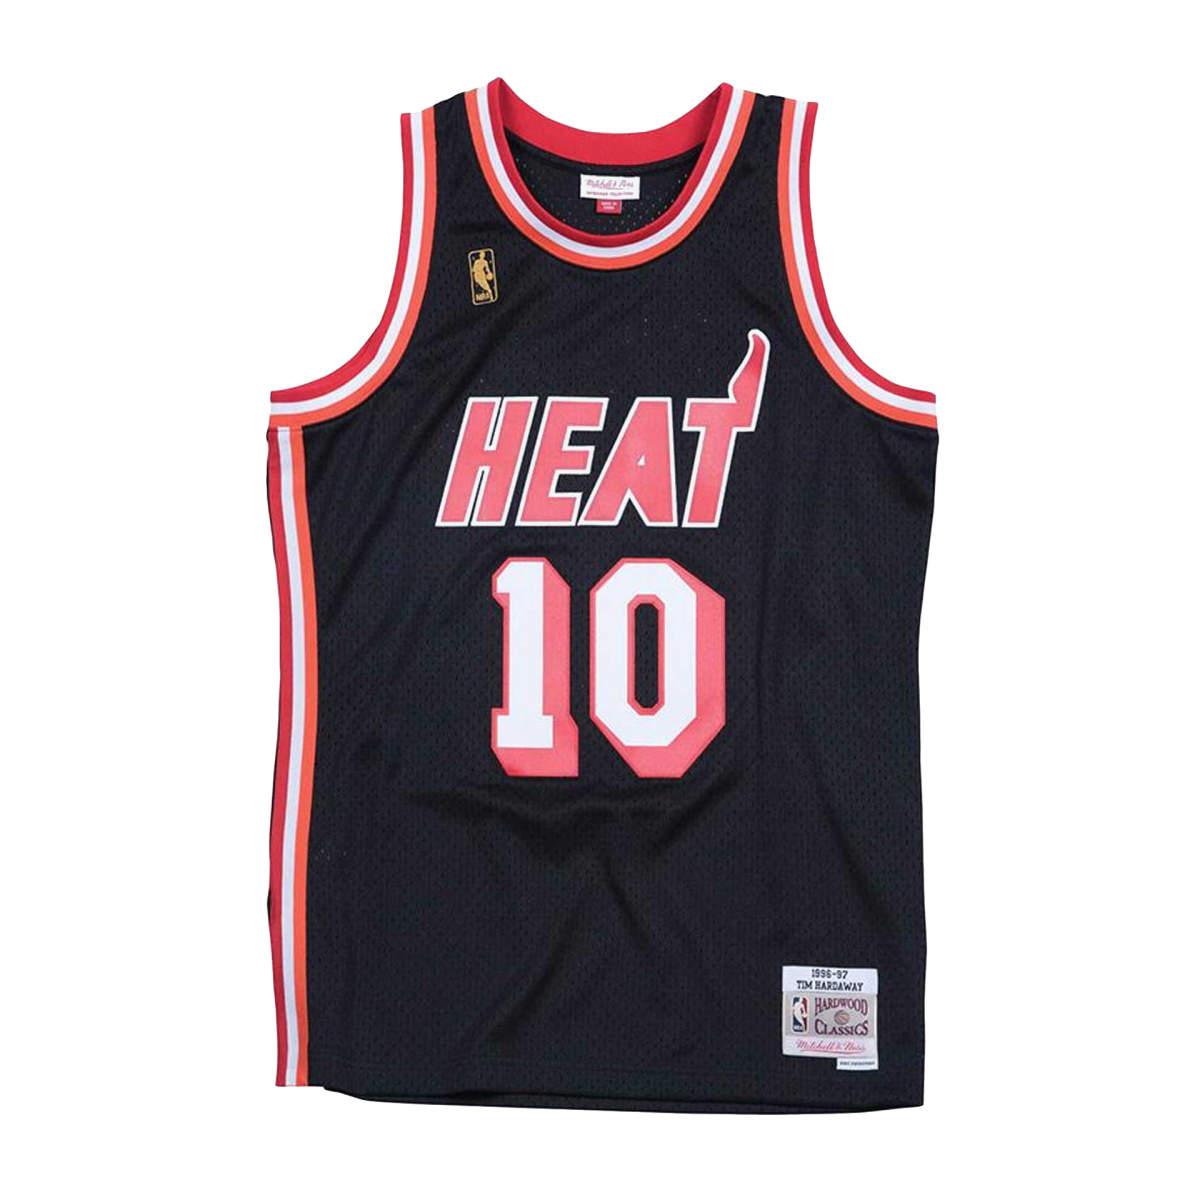 Miami heat swingman jersey 1996-97 hardaway